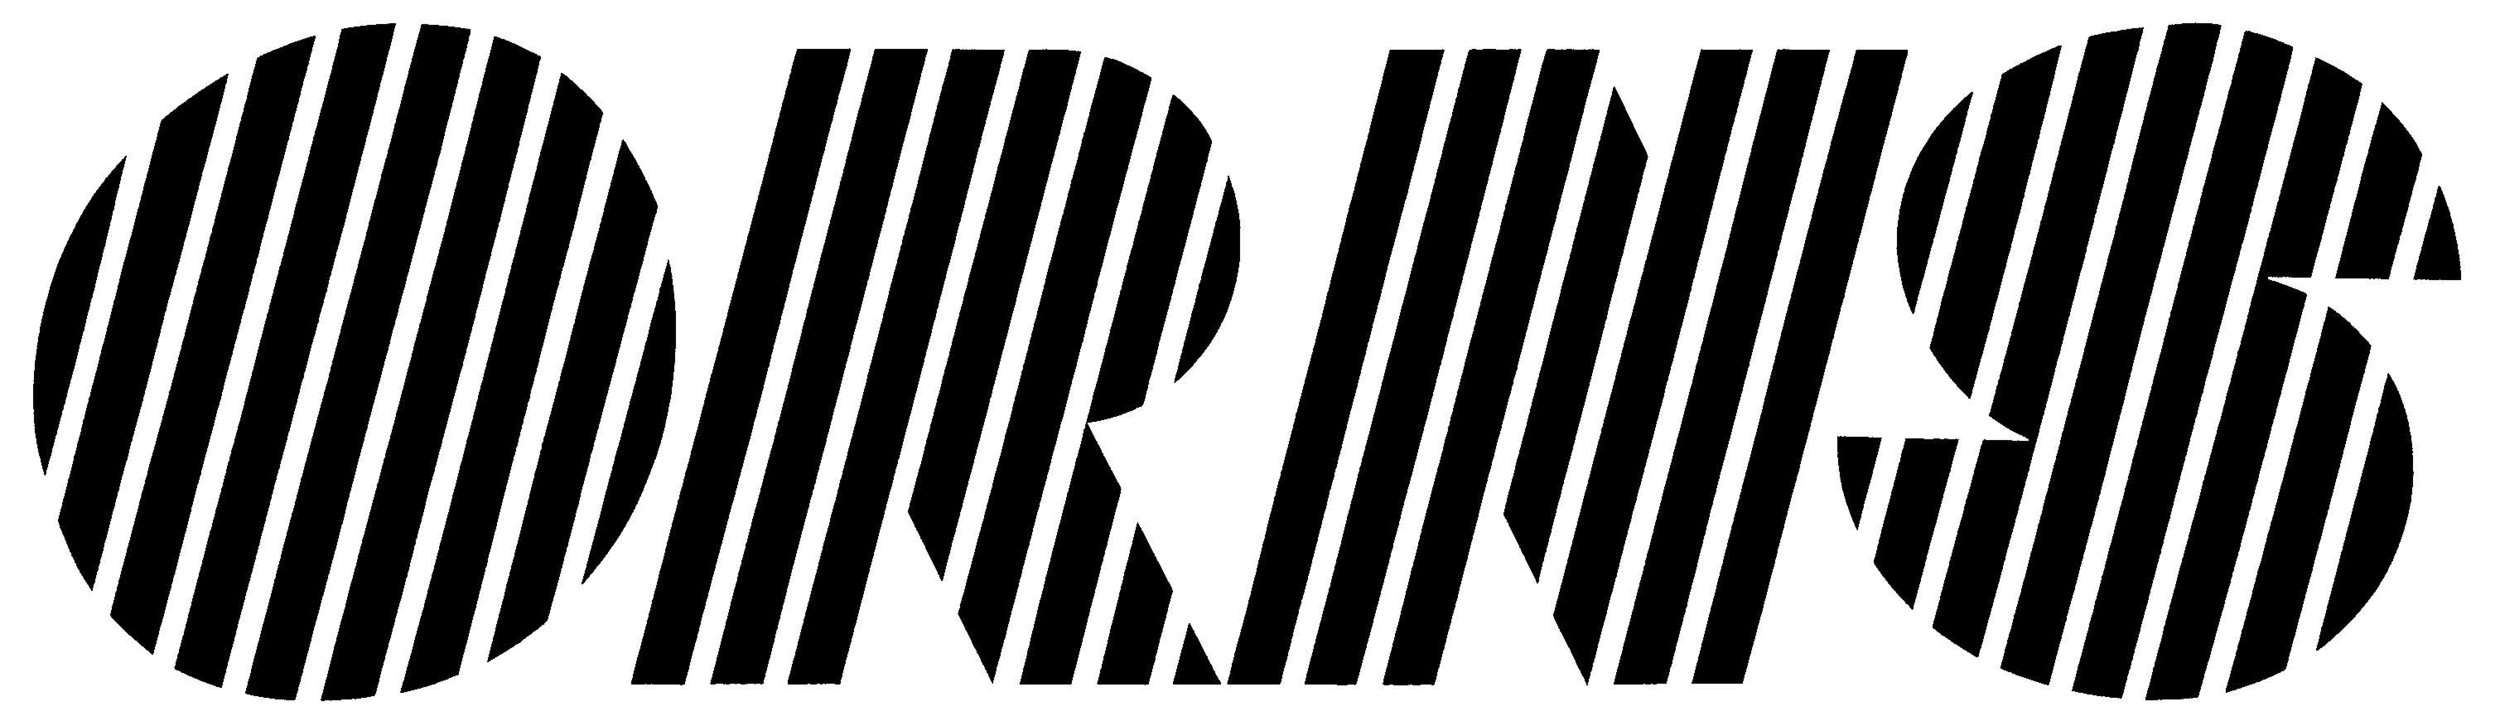 ORNS 4 imprint Logo (reduced).jpg